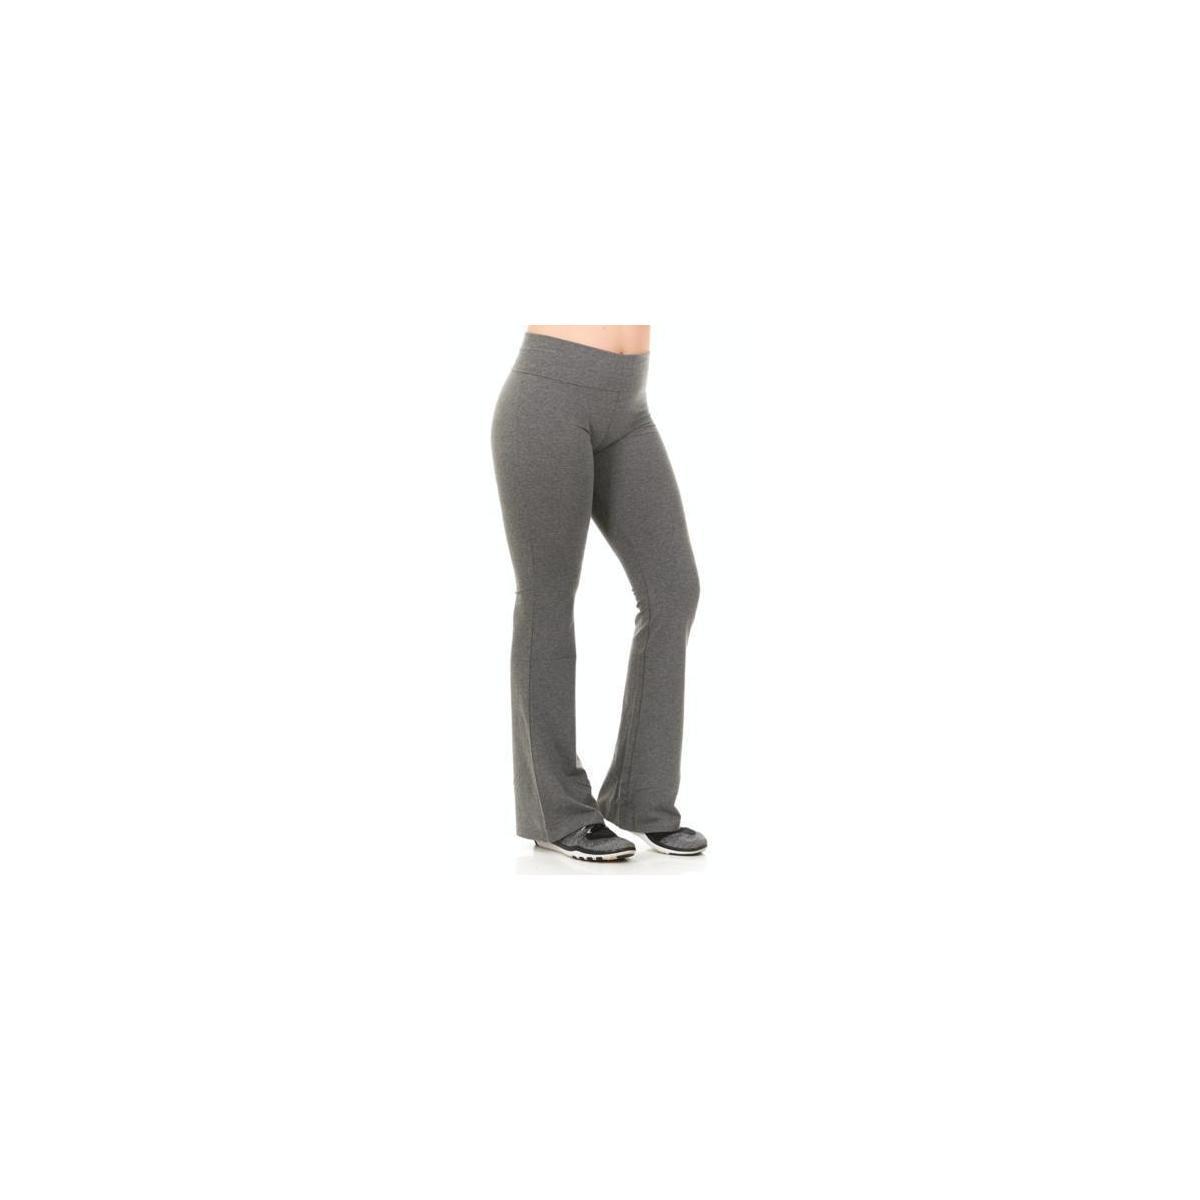 Unique Styles Yoga Pants For Women Fold Over Waistband Grey Short Small Cashback Rebate Rebatekey